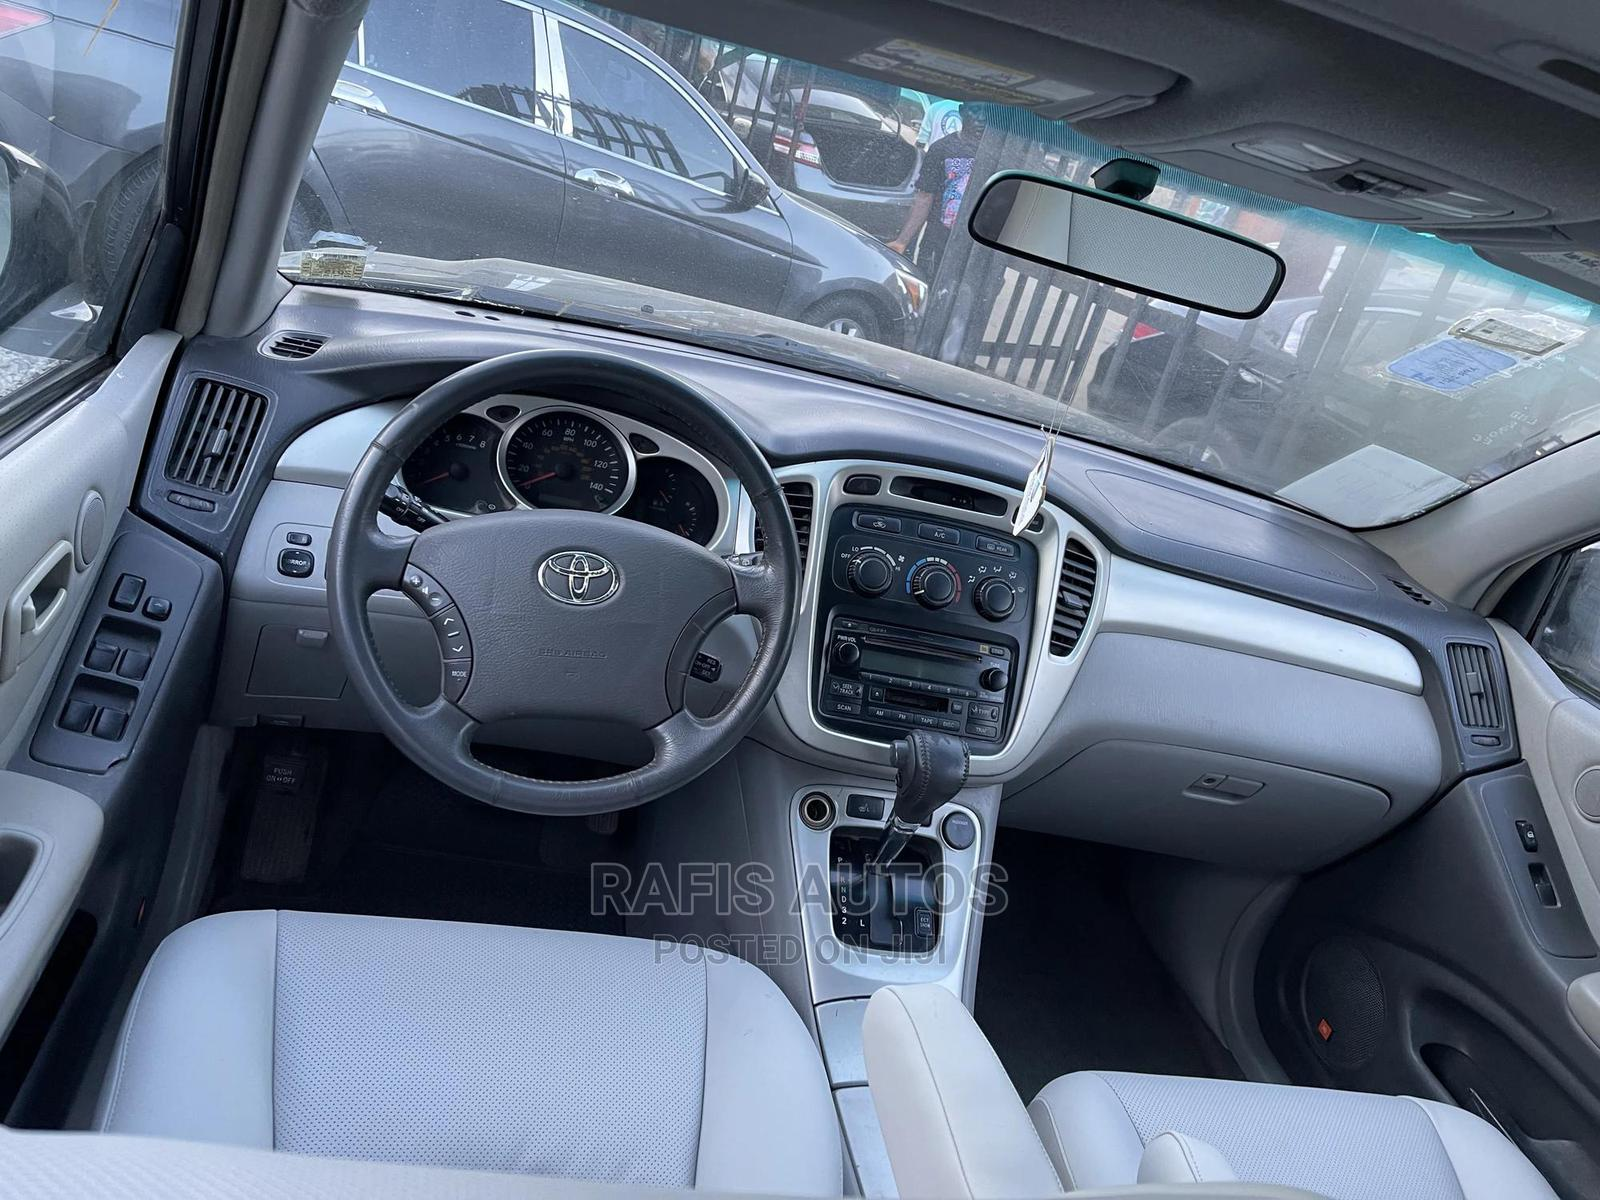 Toyota Highlander 2004 Limited V6 4x4 Black | Cars for sale in Yaba, Lagos State, Nigeria